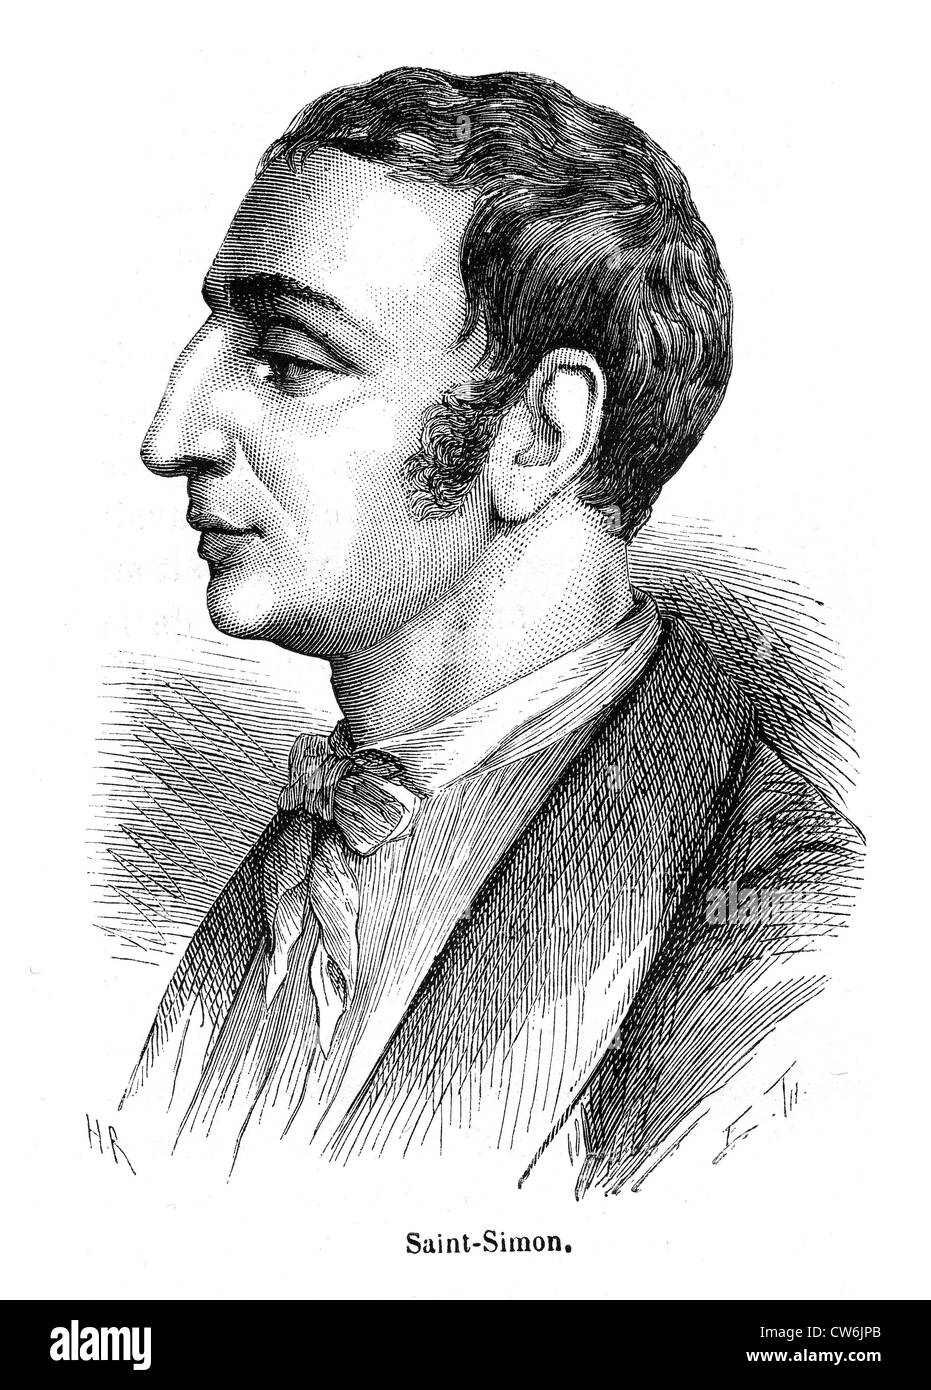 Count of Saint Simon - Stock Image